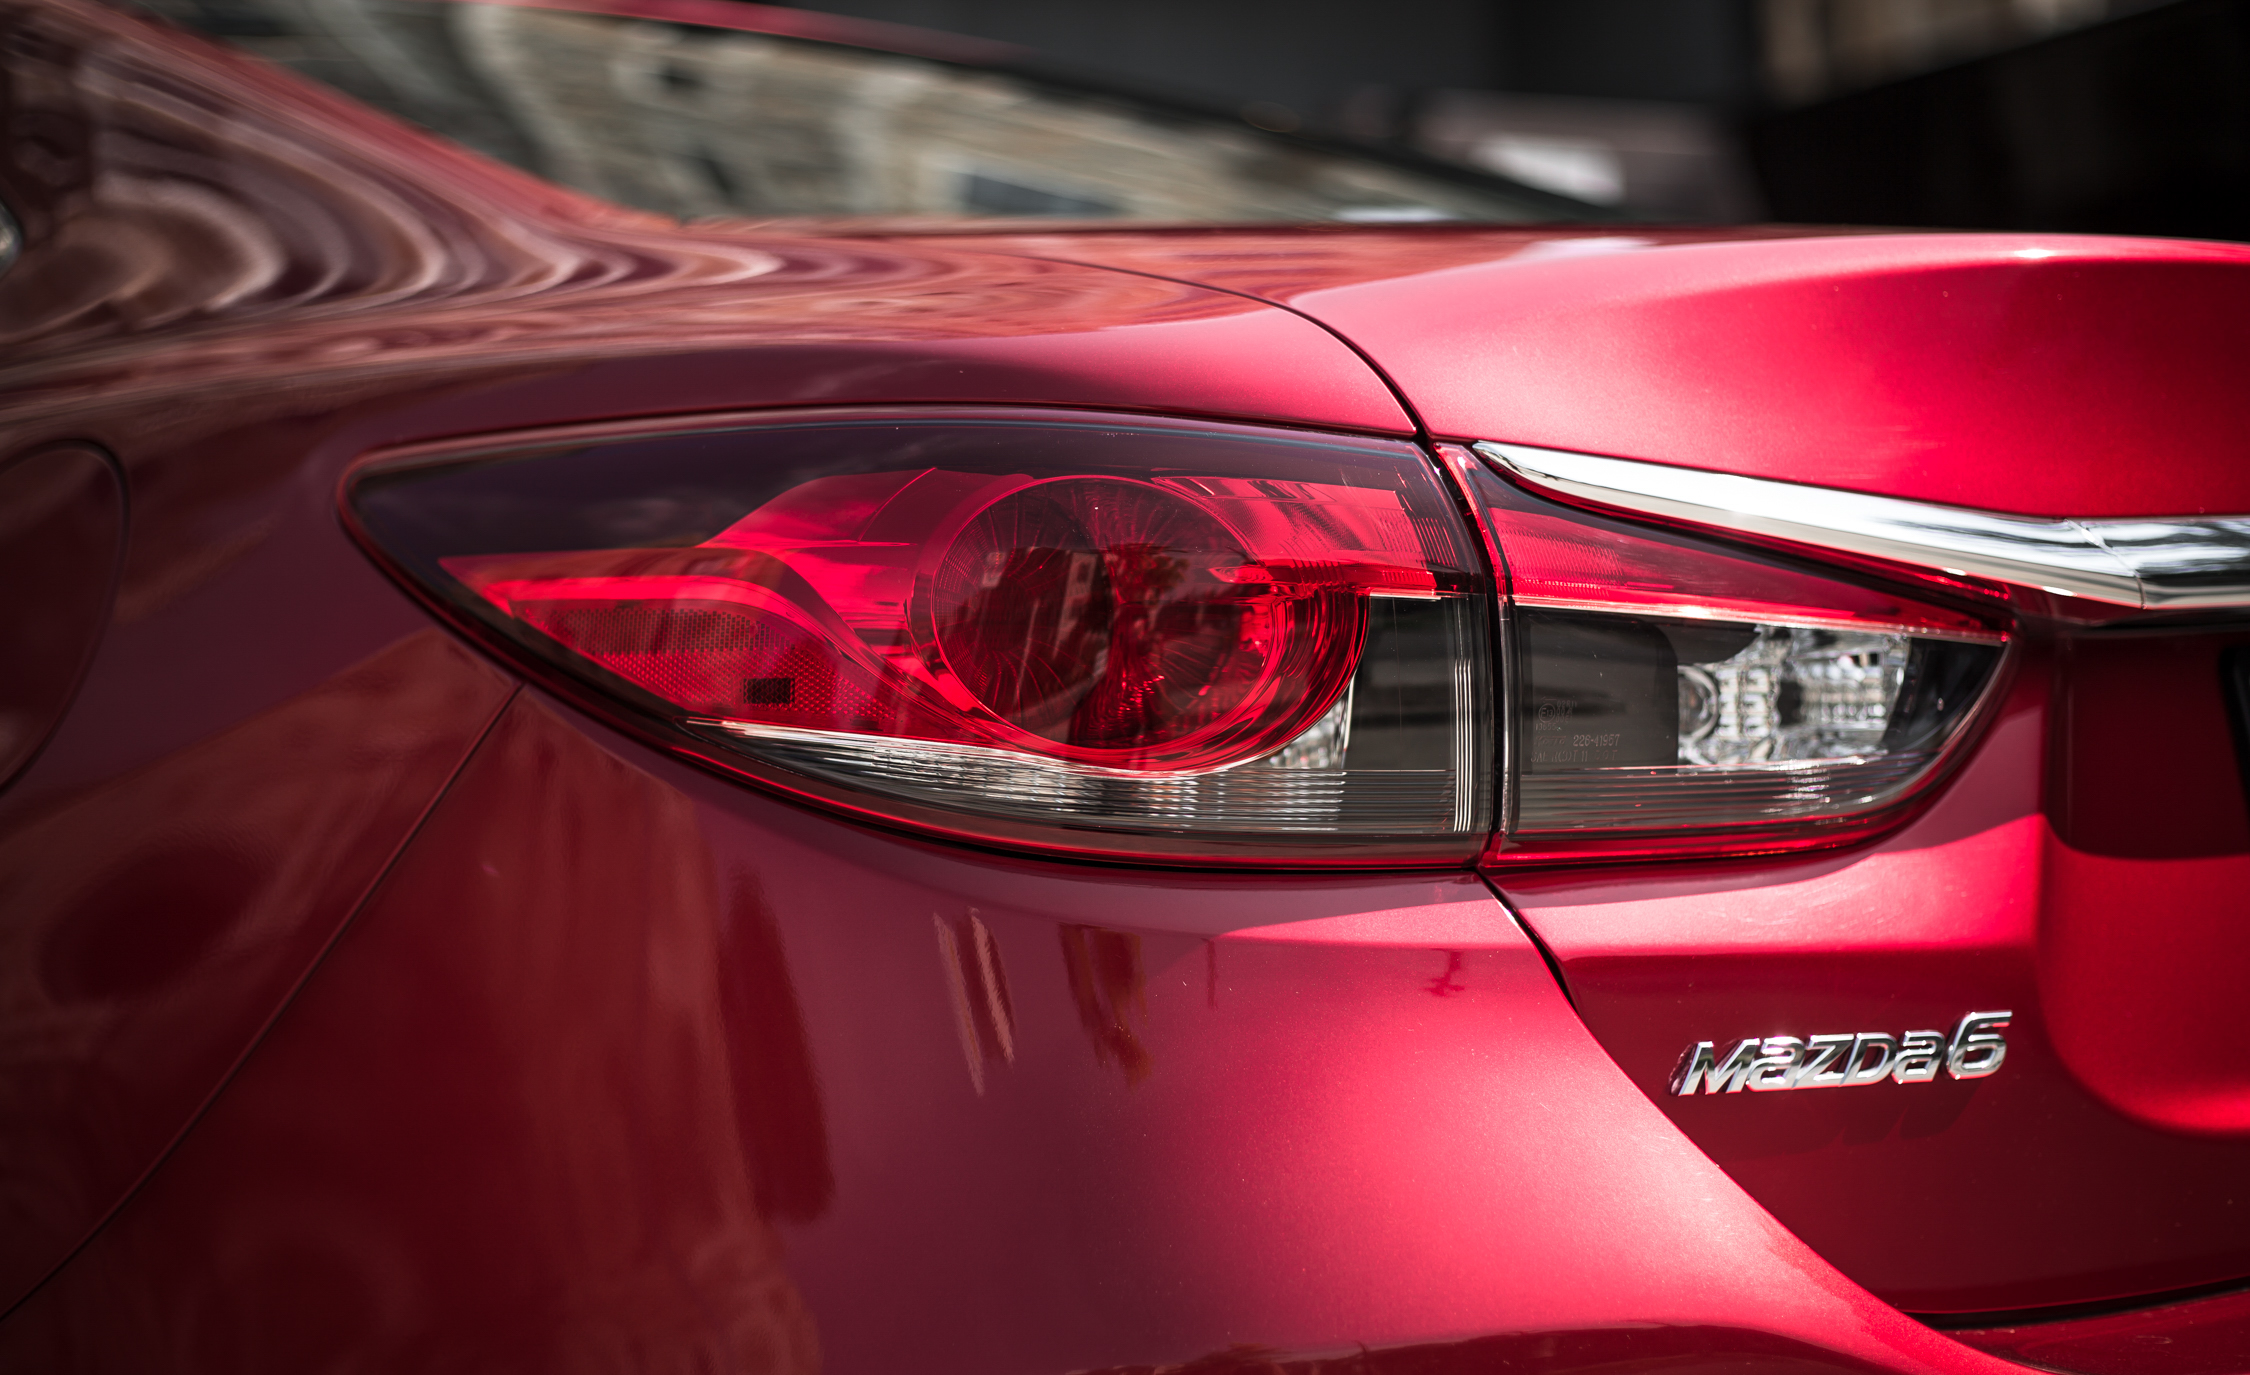 2016 Mazda 6 Touring Exterior Left Taillight